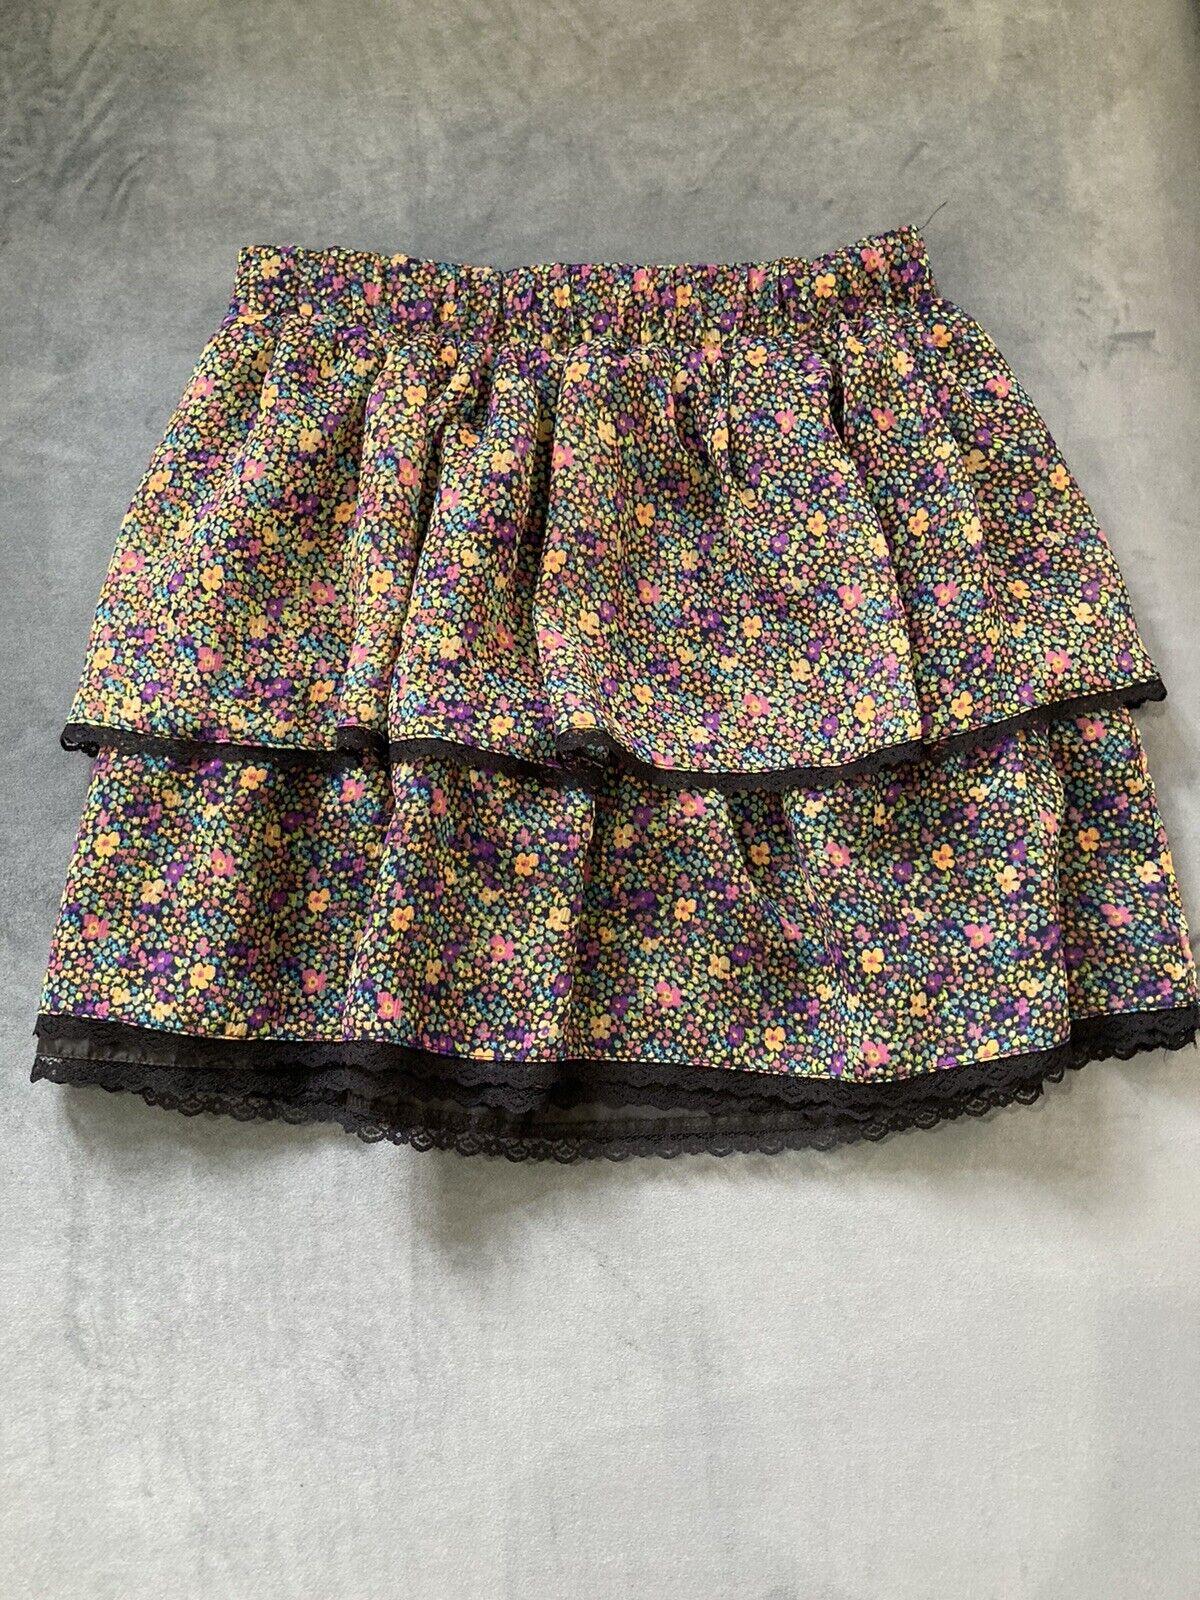 Delias Floral Fairycore Grunge Skirt Medium - image 1